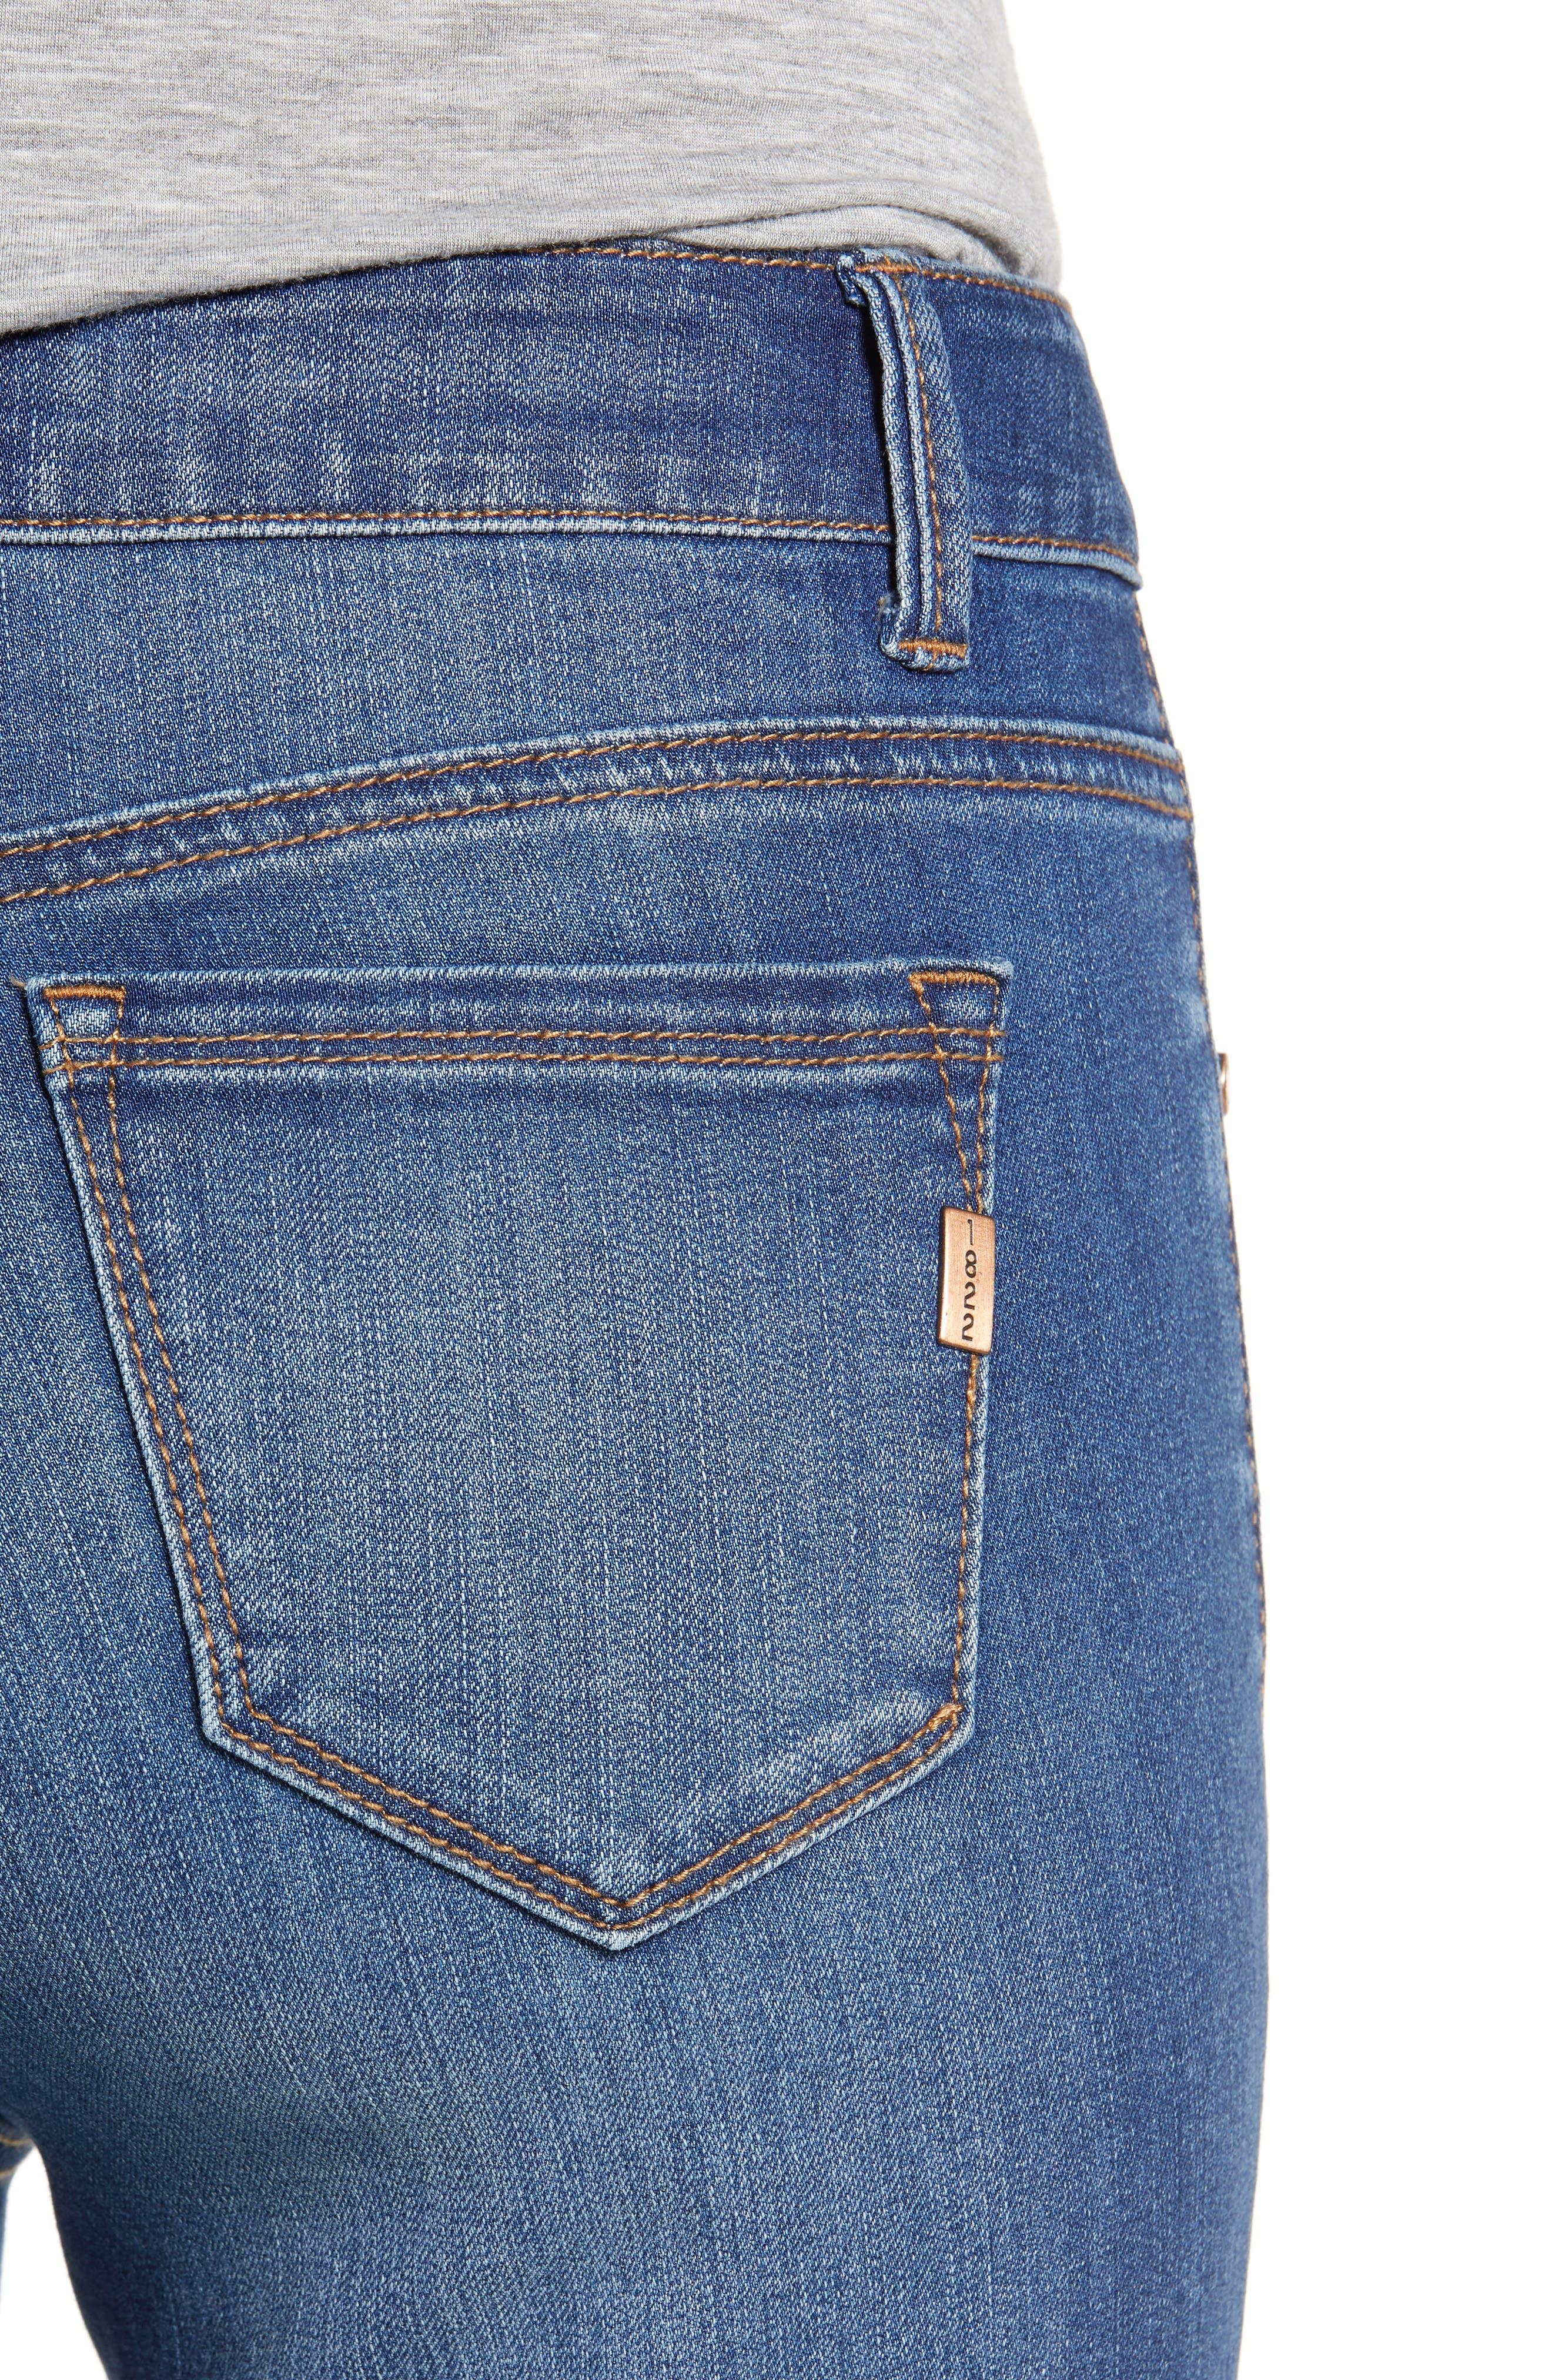 Crop Bootcut Jeans,                             Alternate thumbnail 4, color,                             TESSA